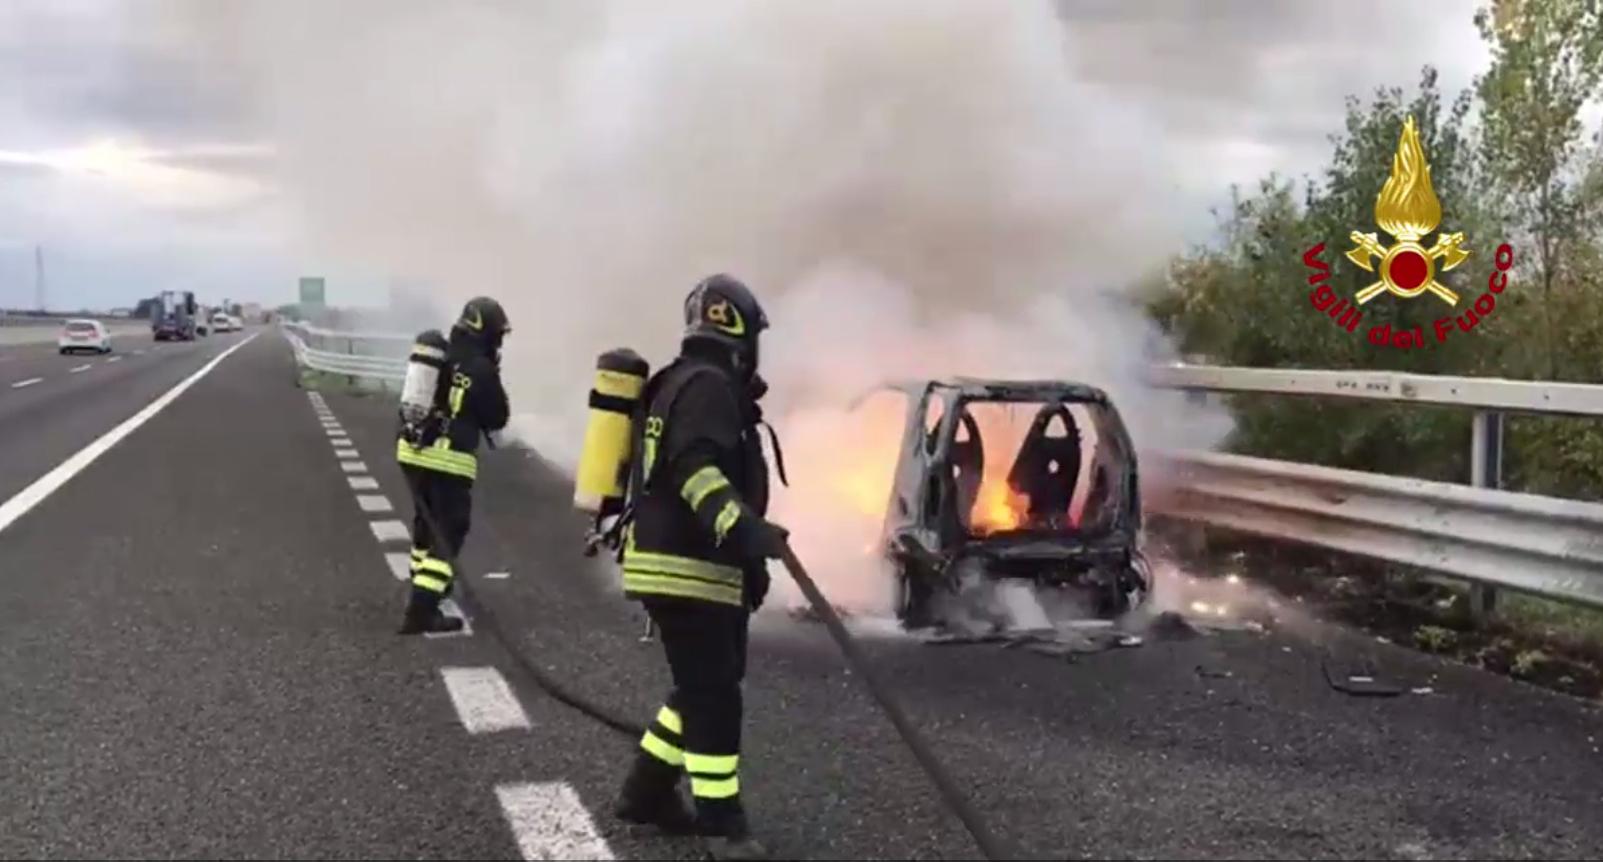 Fiamme distruggono Smart in autostrada a Rimini - VIDEO